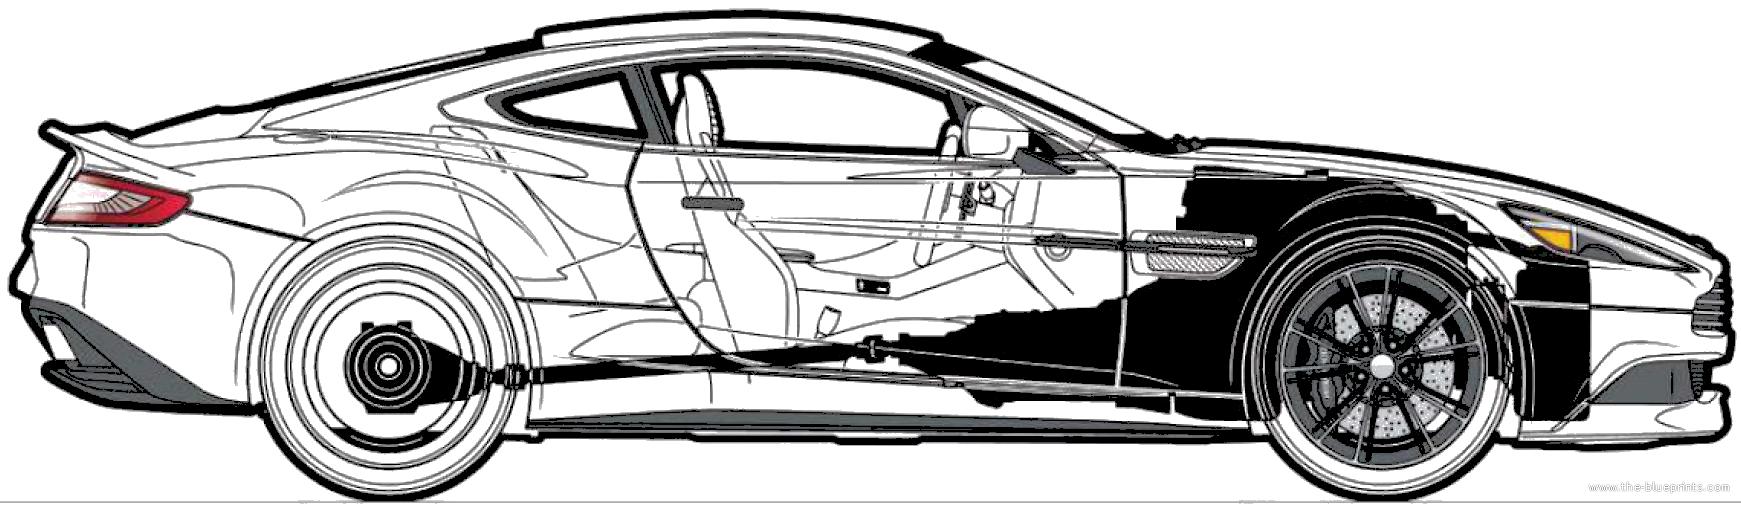 Aston Martin Vanquish (2013) - Aston Martin Auto Vector, Transparent background PNG HD thumbnail